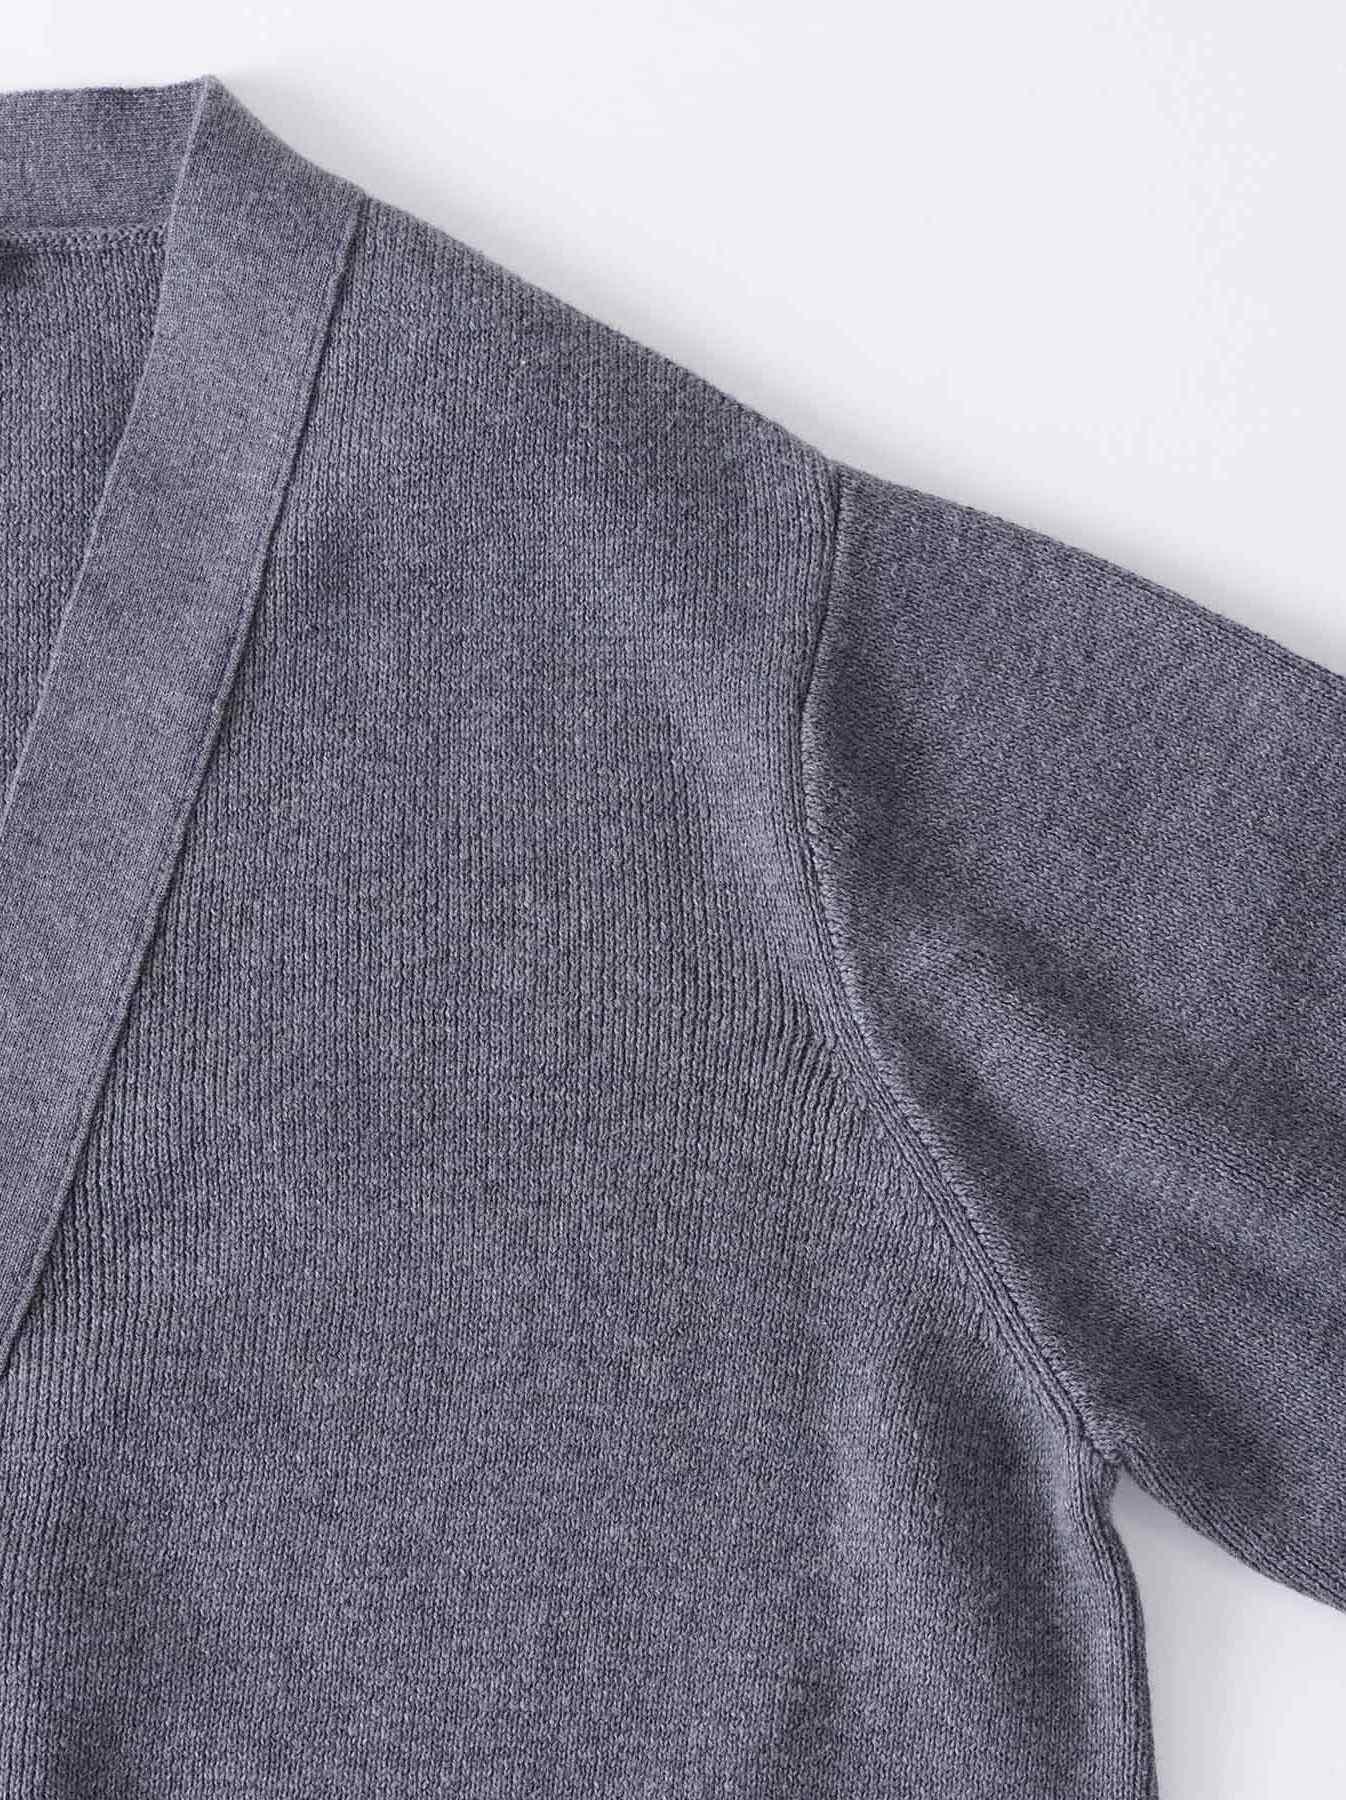 WH Supima Knit-sew Coat-7